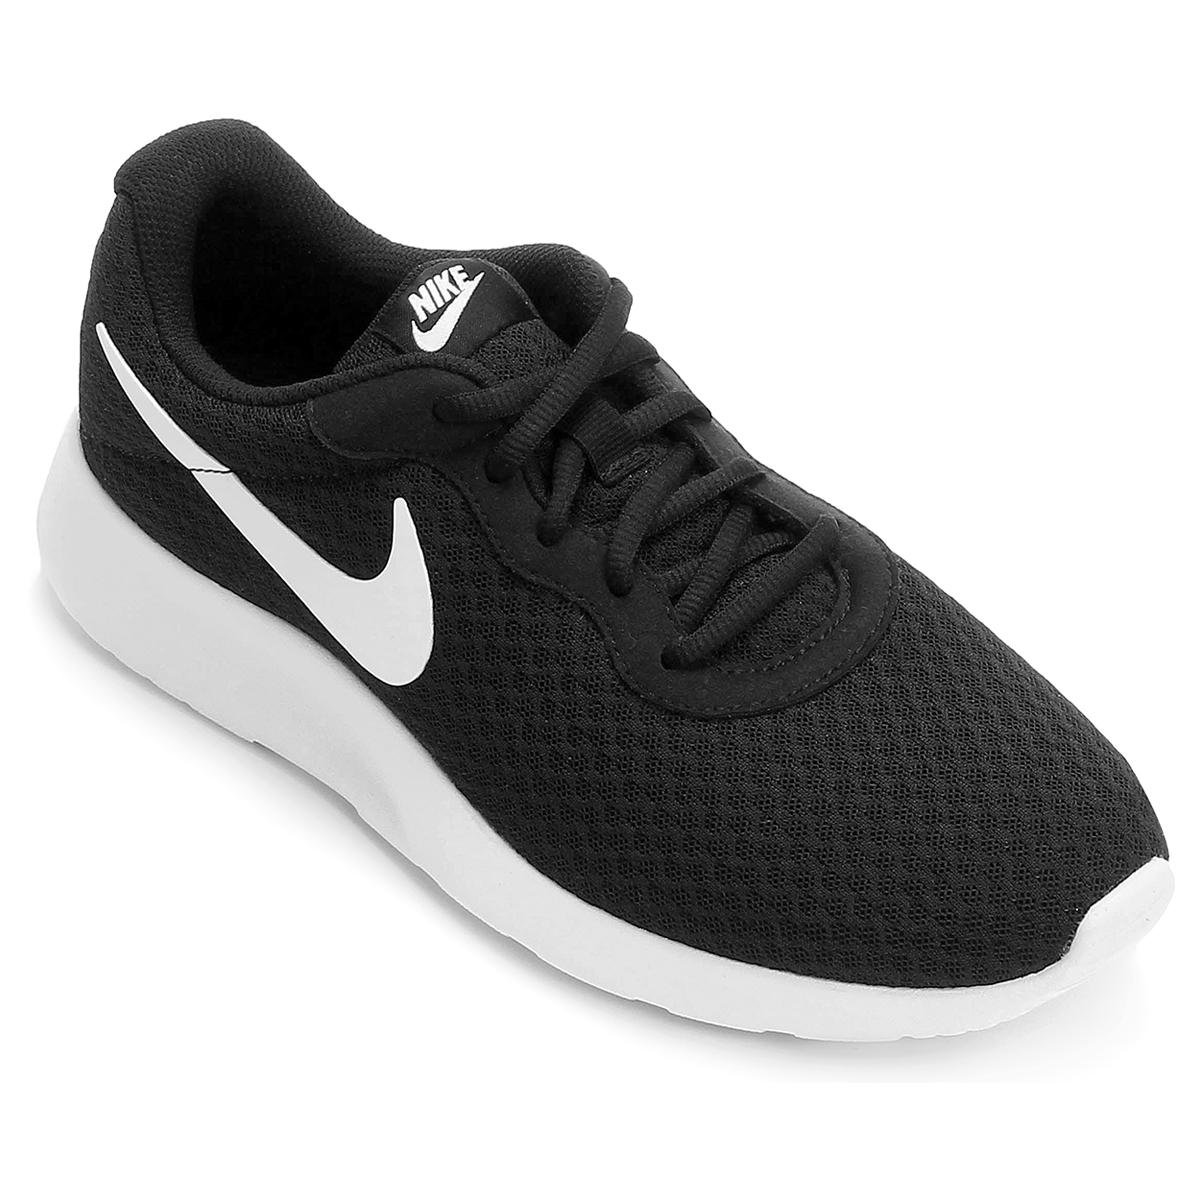 54cd3ac5787 Tênis Nike Tanjun Masculino - Preto e Branco - Compre Agora